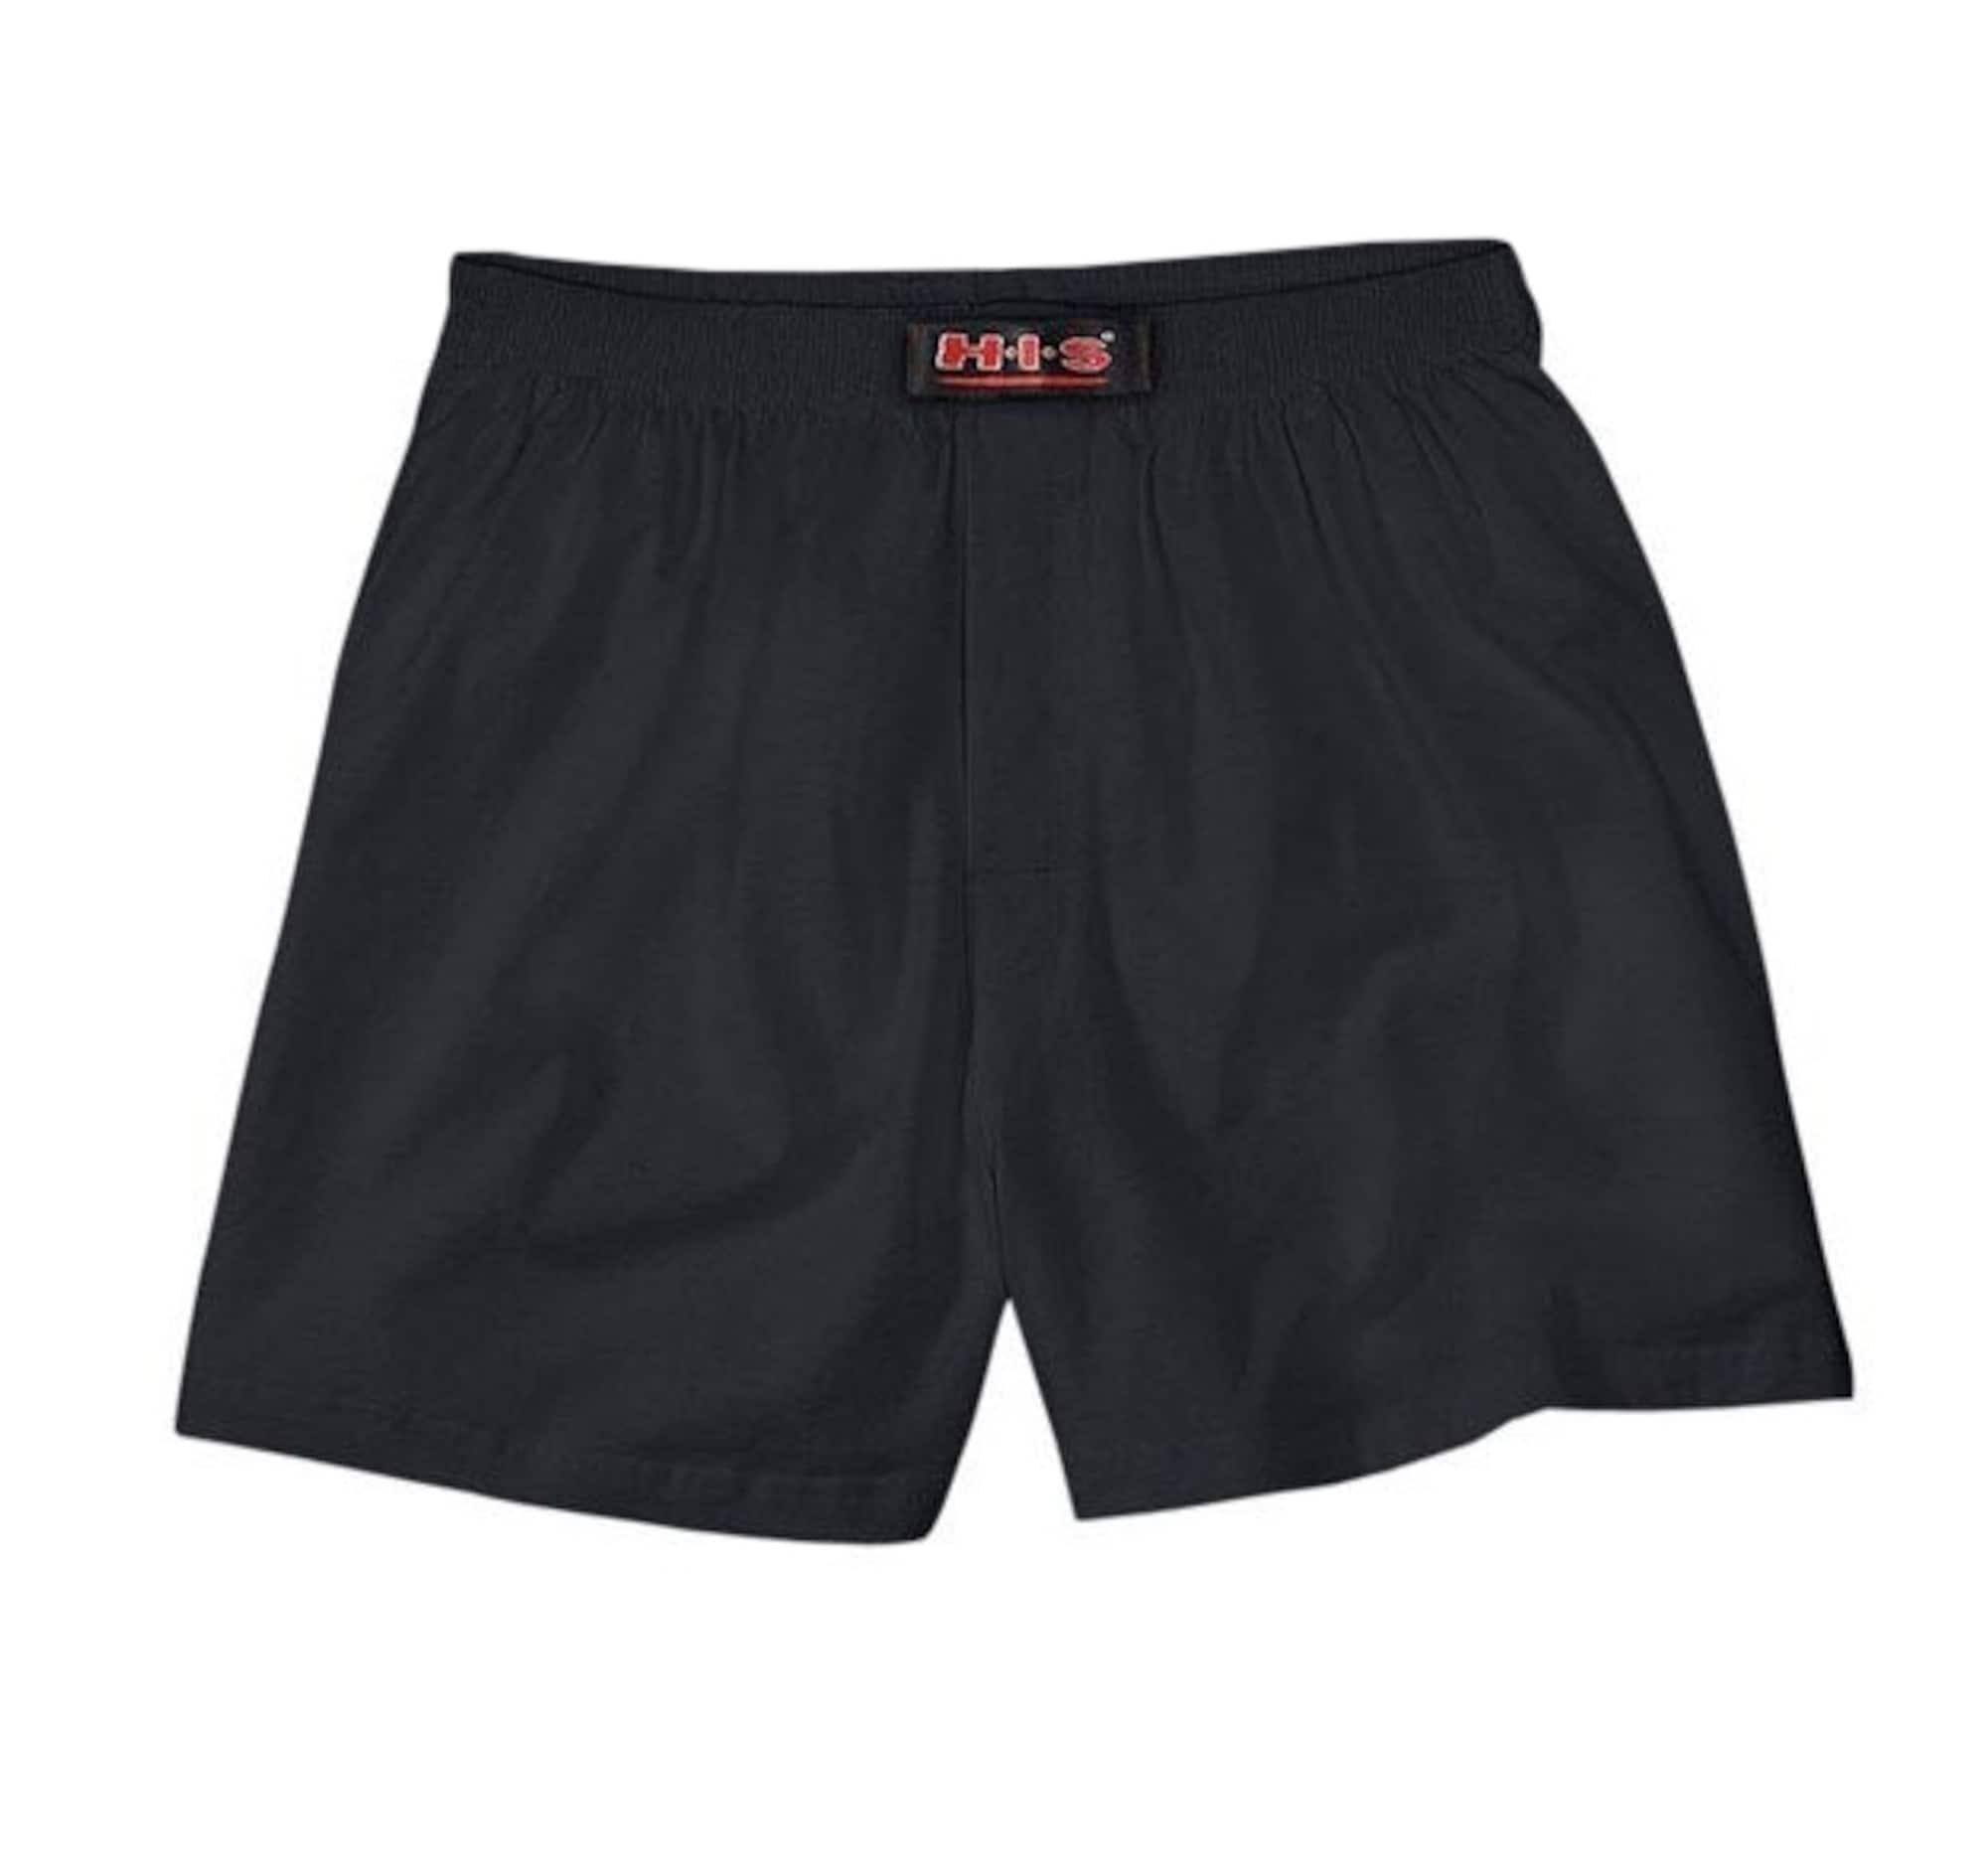 H.I.S, Heren Boxershorts, zwart